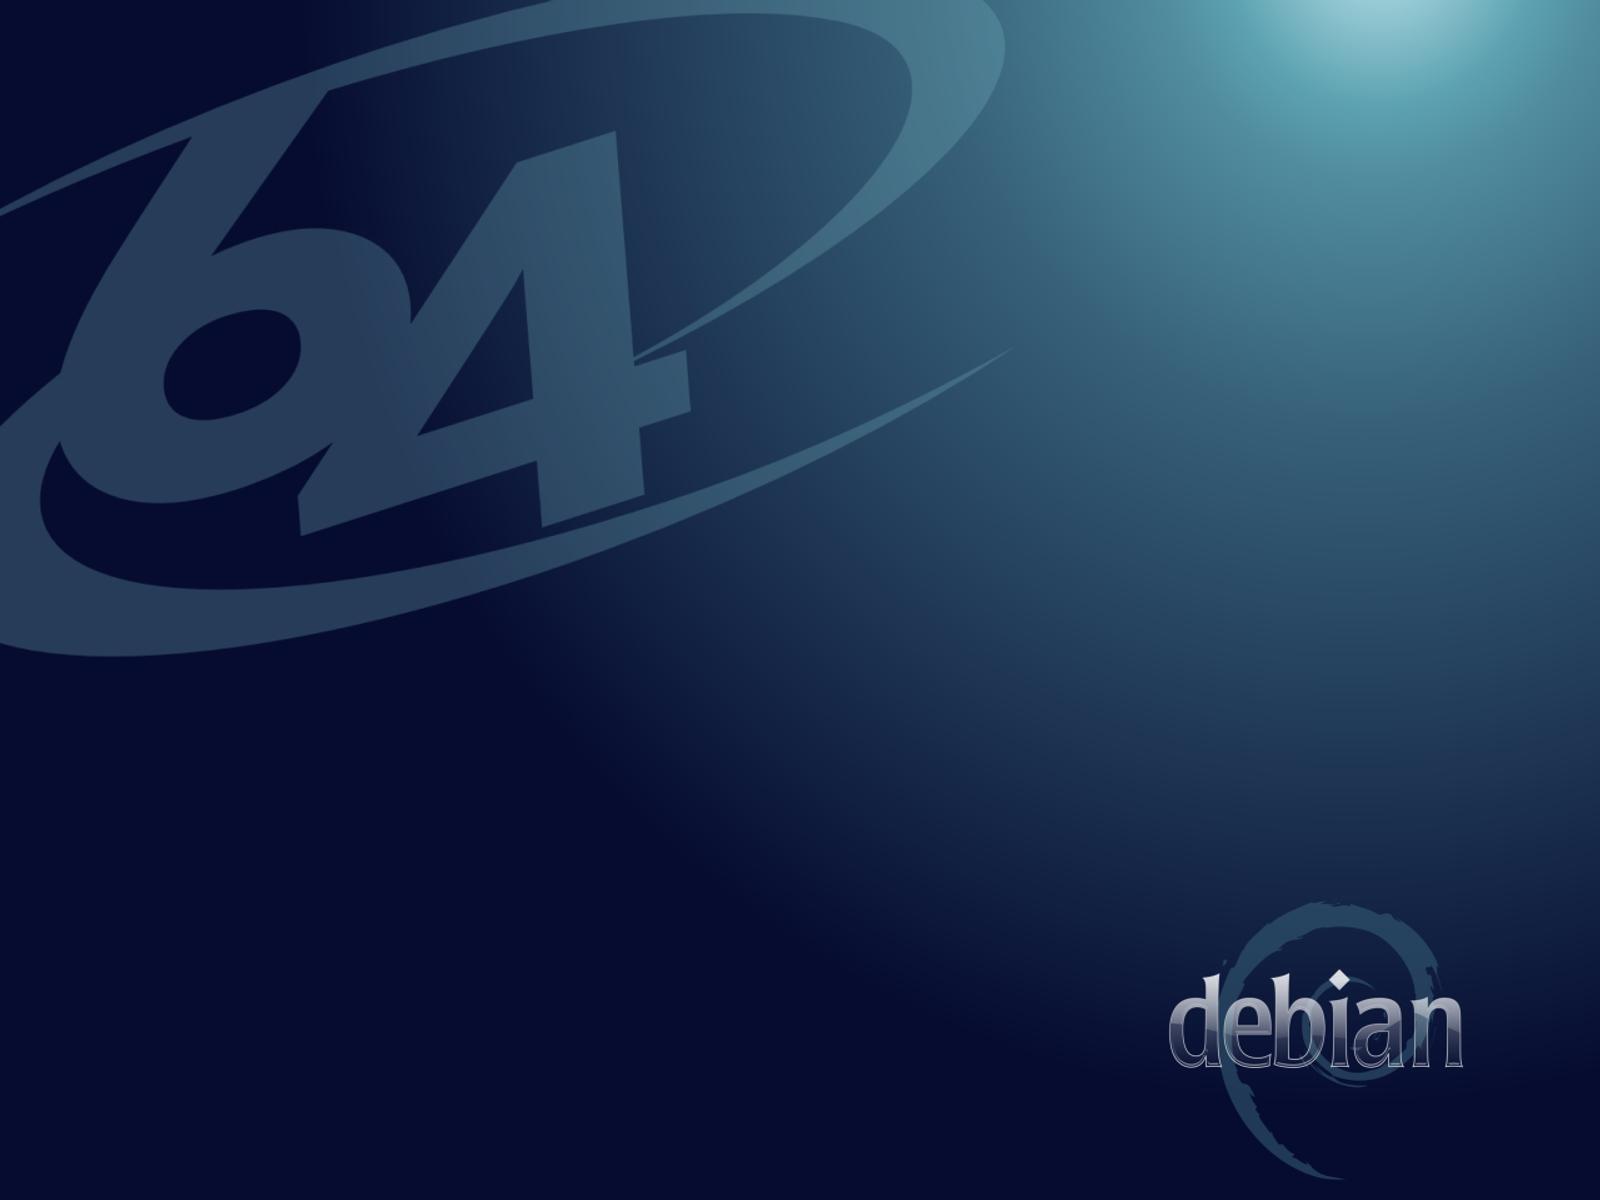 windows 7 video wallpaper 64 bit: Debian Bits And Snips: Debian 64 Bit Wallpaper